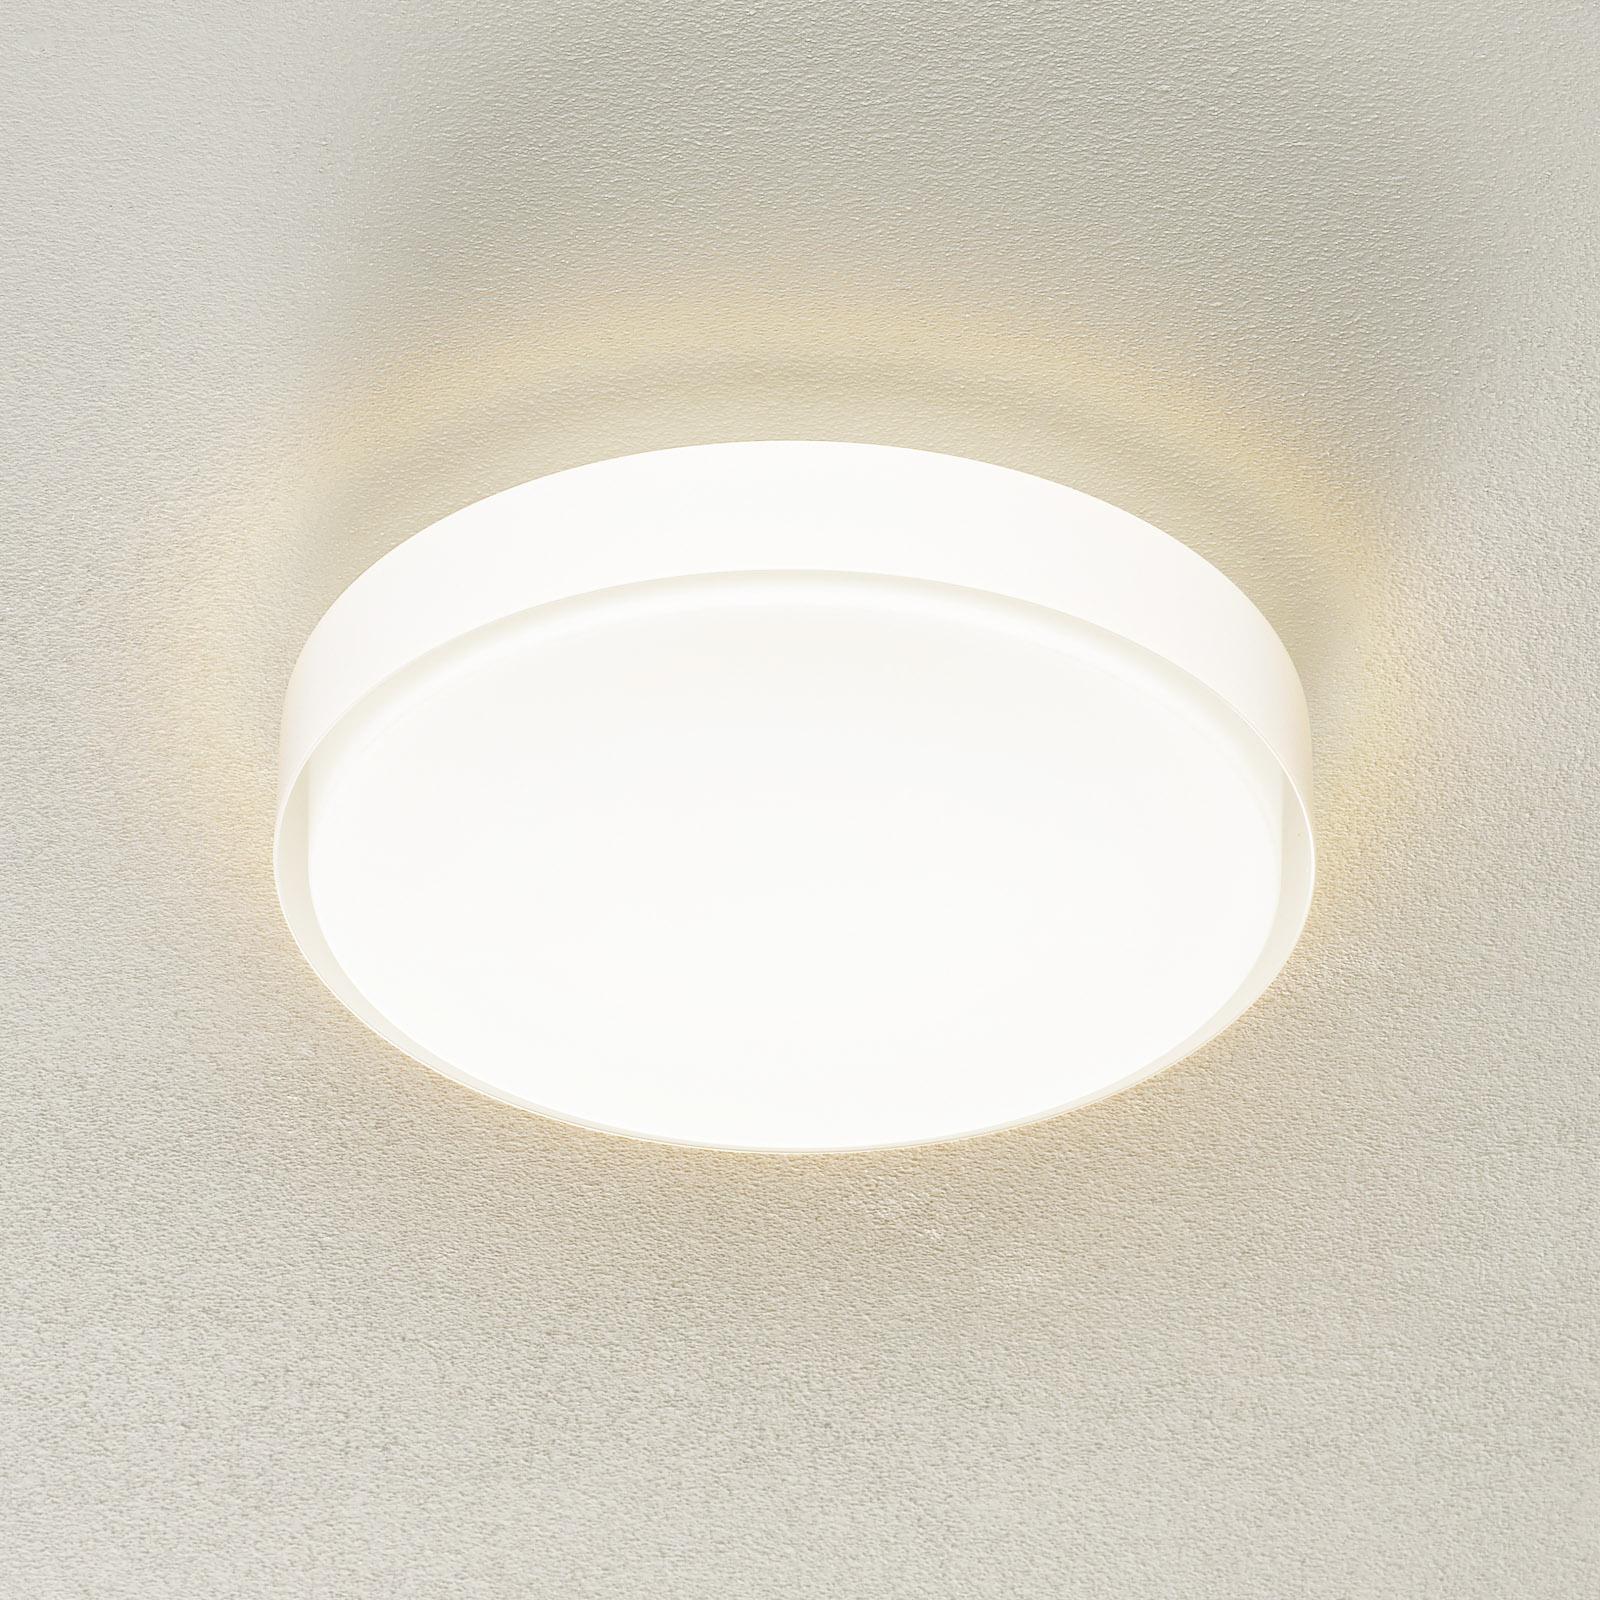 BEGA 34278 LED plafondlamp, wit, Ø 36 cm, DALI